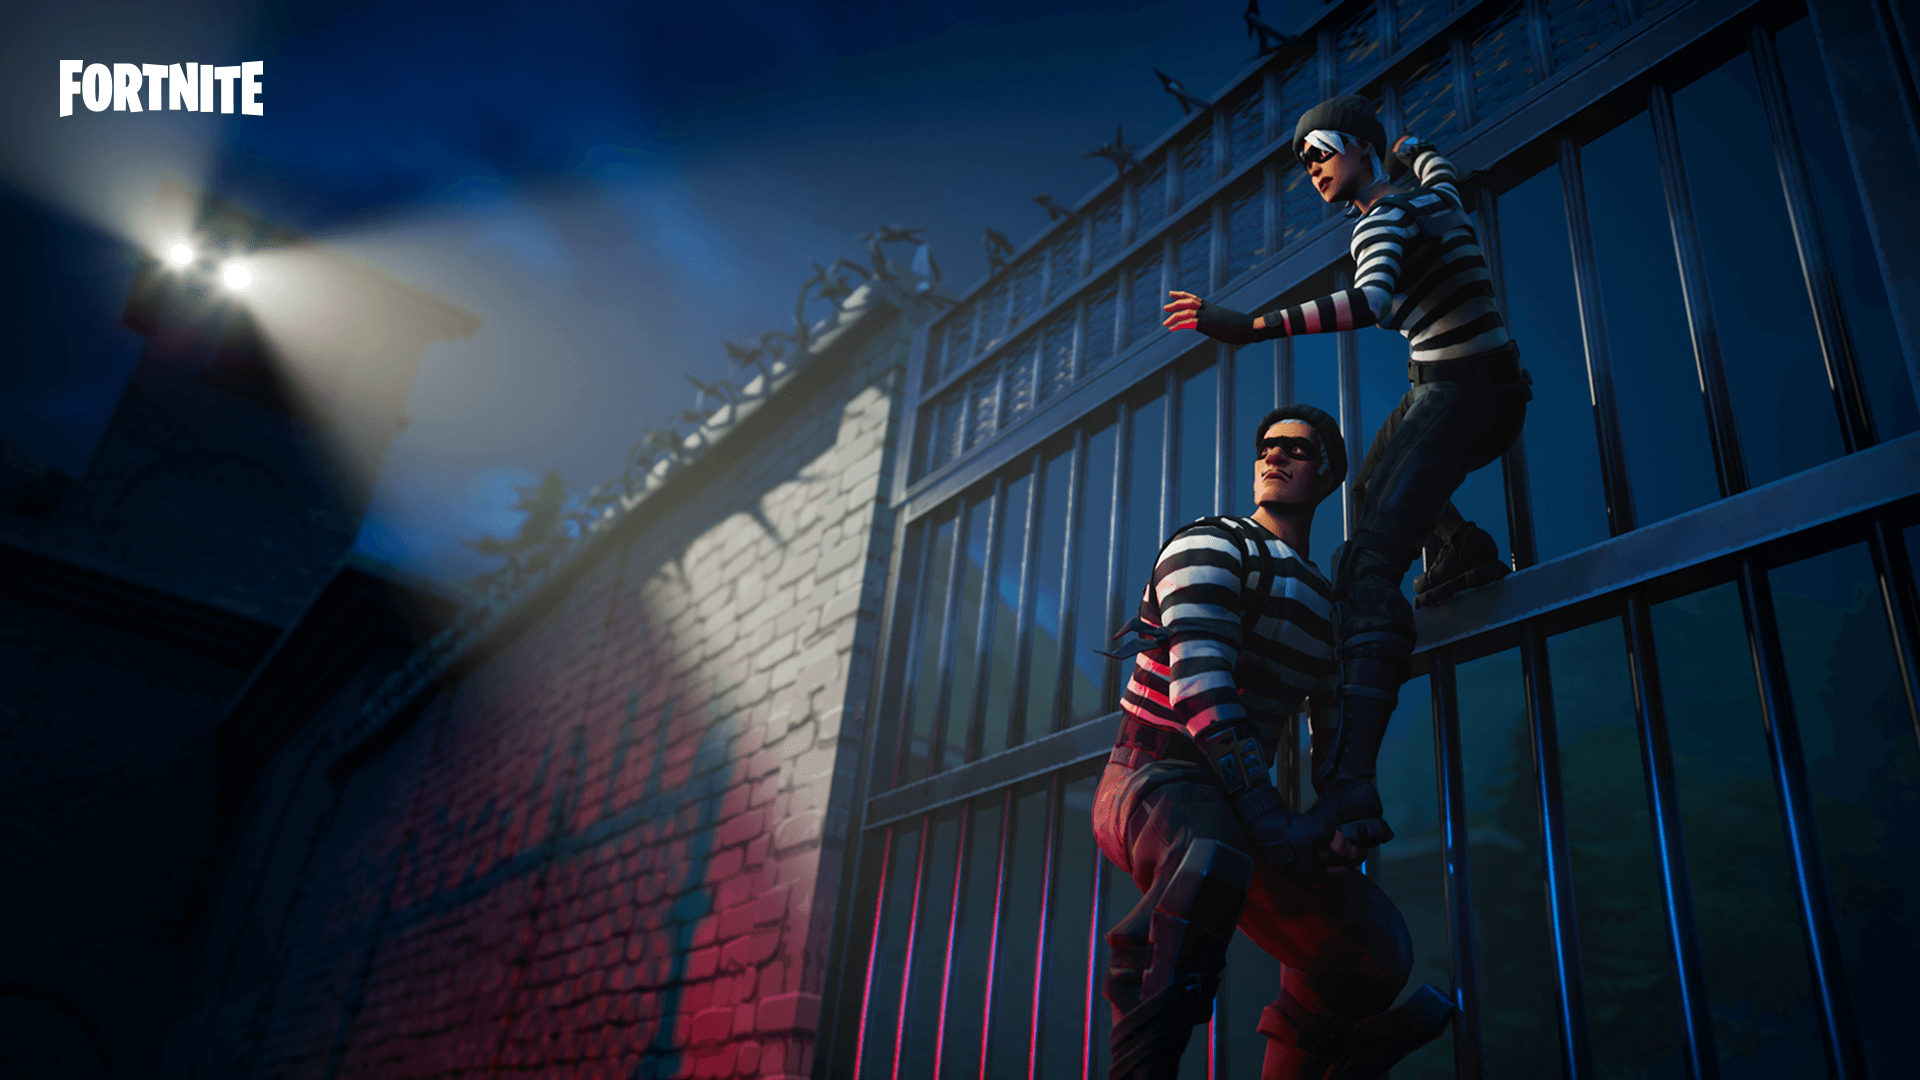 Fortnite Creative Prison Breakout by Echo